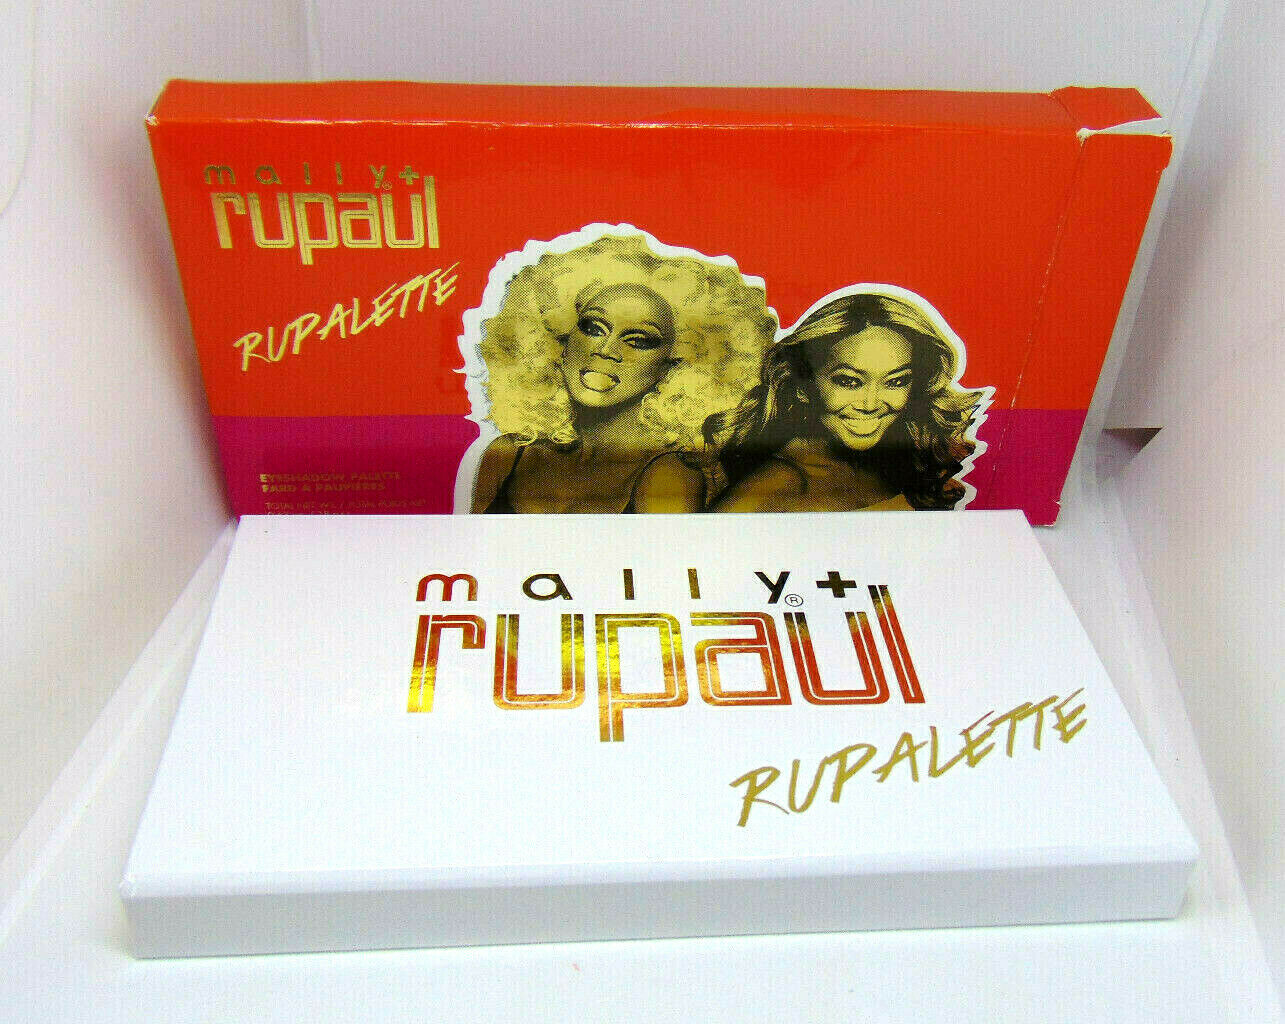 MALLY + RUPAUL RUPALETTE Eyeshadows Palette  0.63oz/18g NIB - $54.65